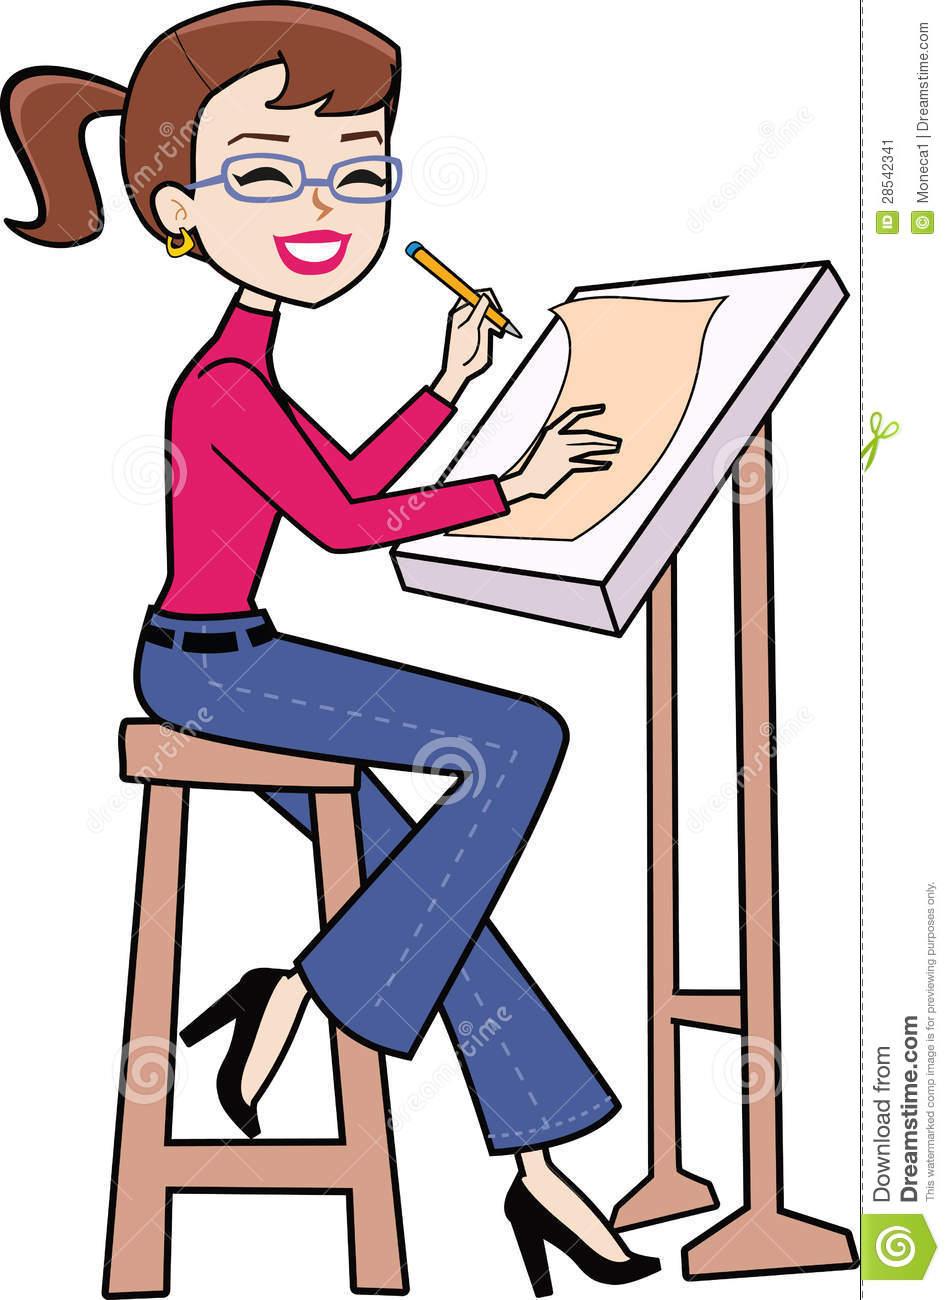 Artistic woman clipart jpg freeuse Artistic woman clipart - ClipartFox jpg freeuse